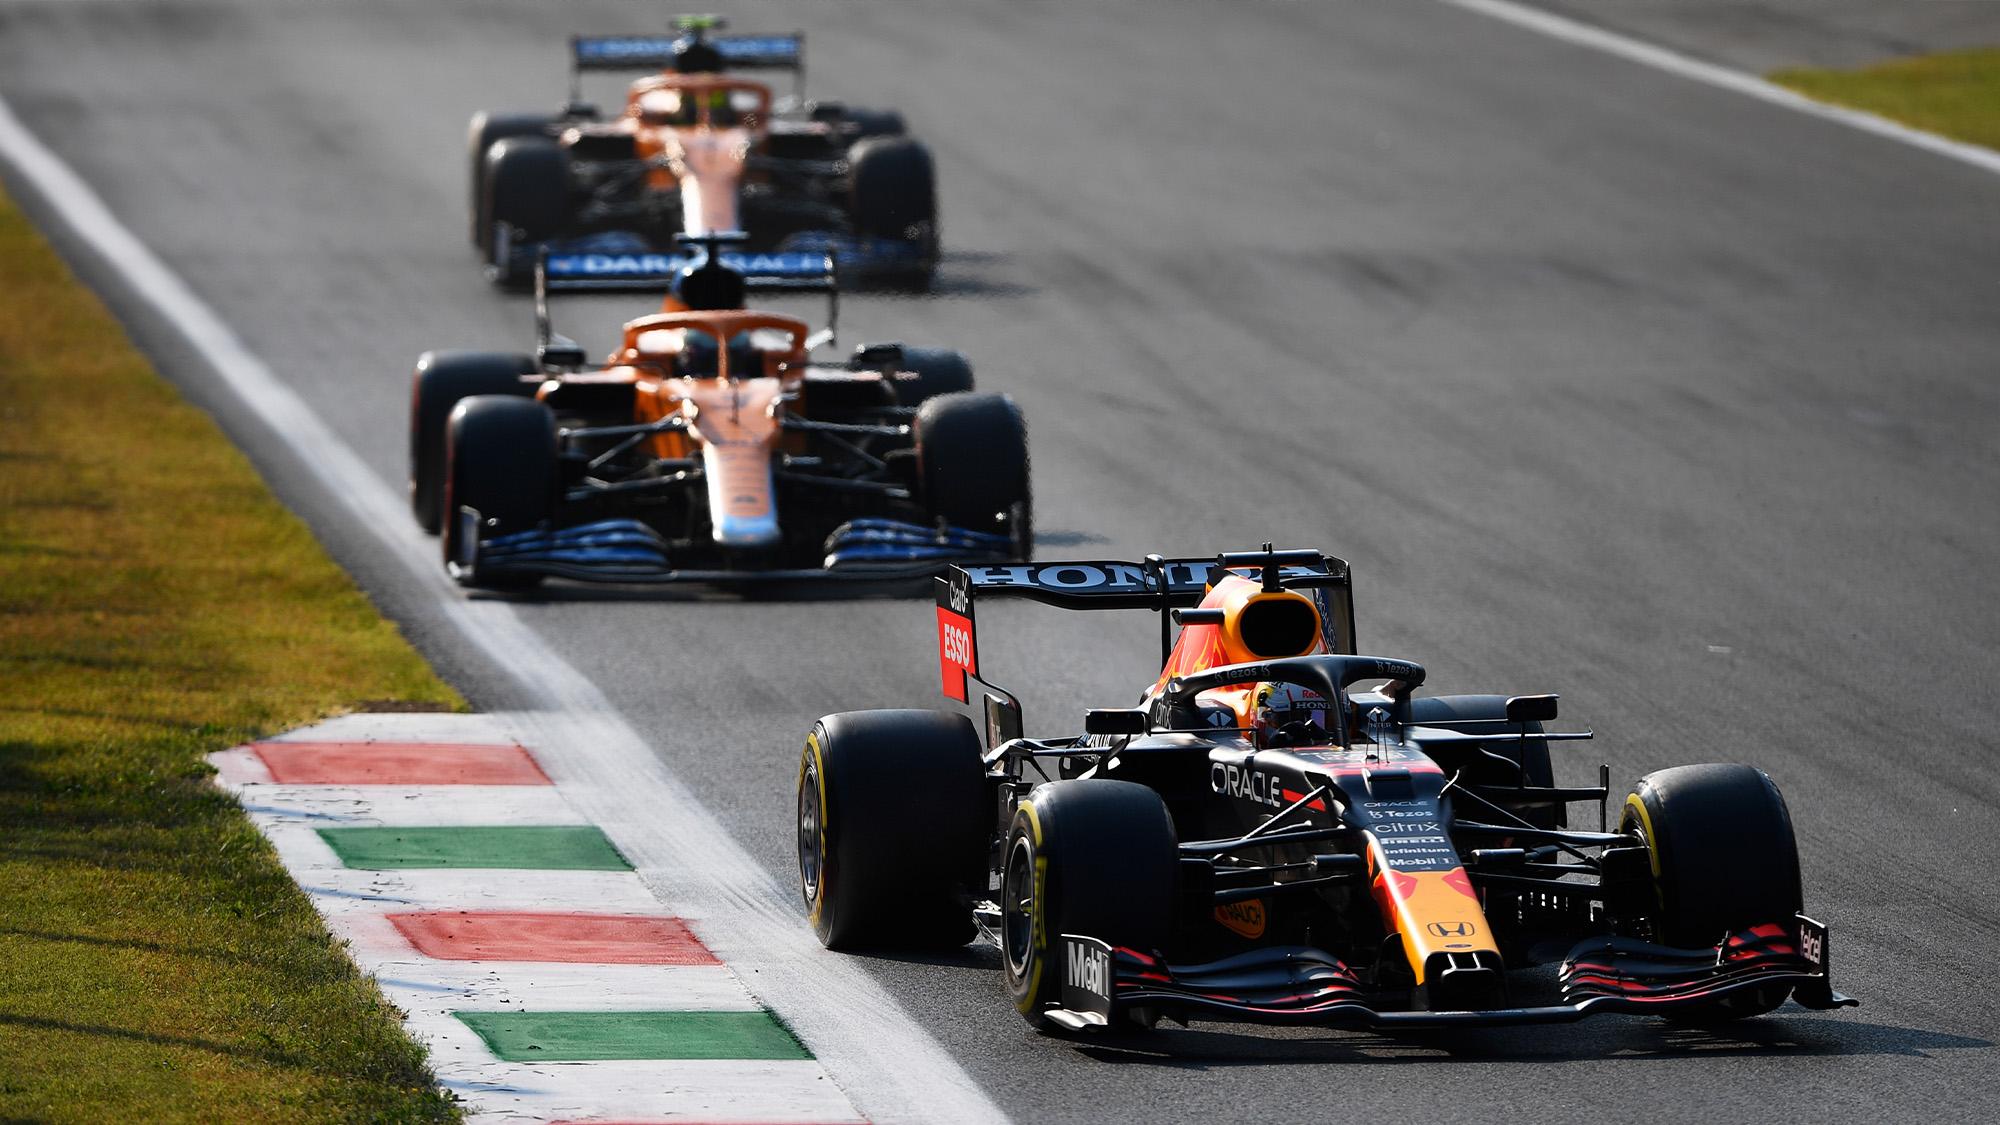 Max Verstappen ahead of Daniel ricciardo and Lando Norris at the 2021 Italian GP sprint qualifying